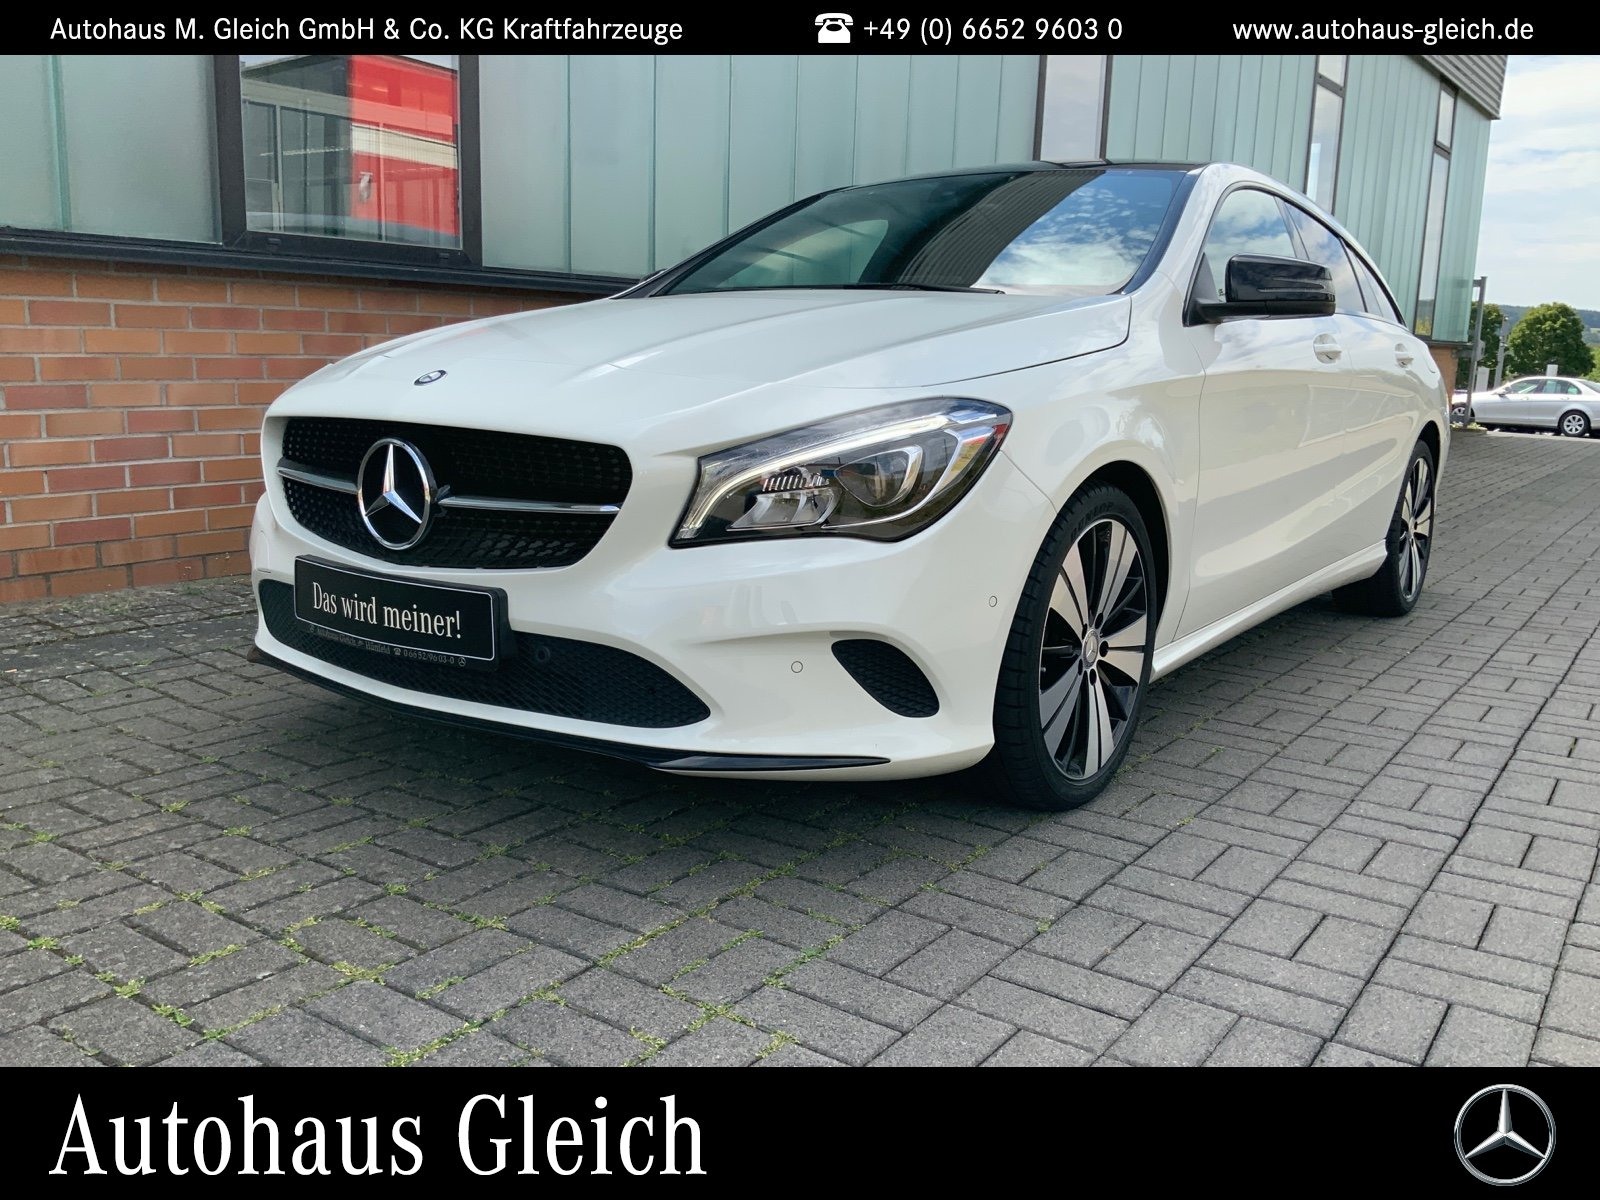 Mercedes-Benz CLA 180 Shooting Brake Urban/Navi/Pano.-Dach/LED, Jahr 2016, Benzin